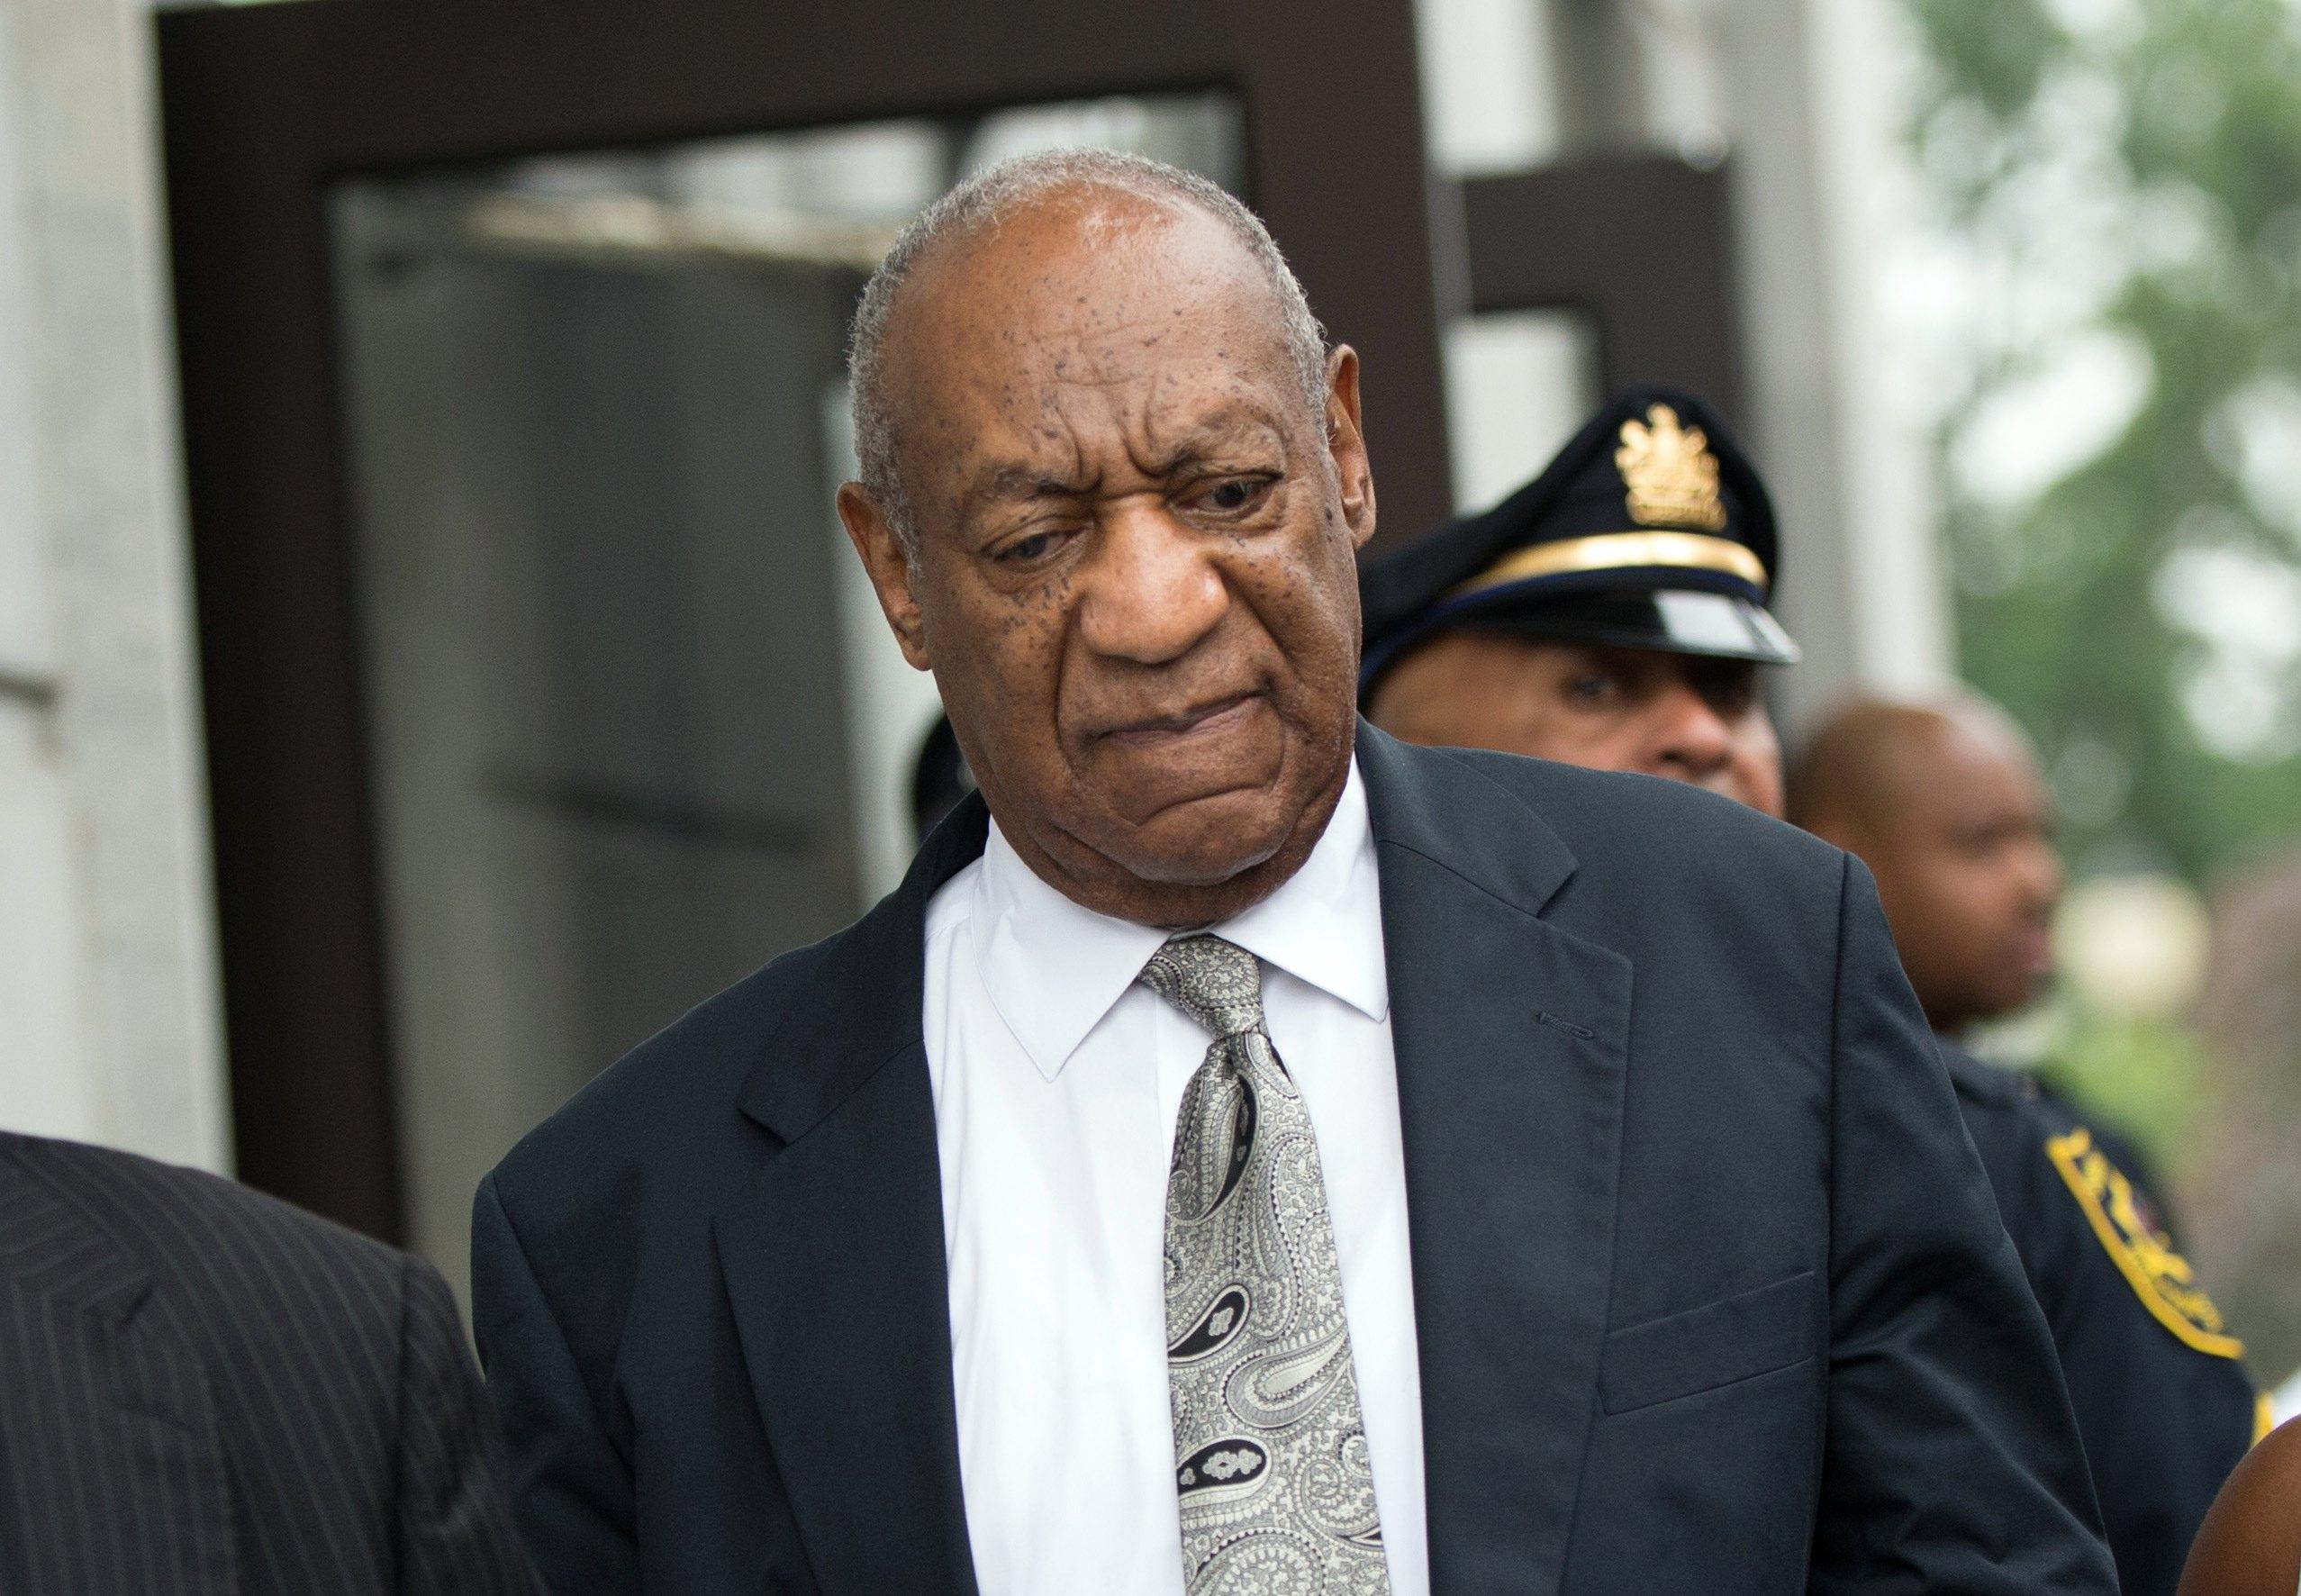 Bill Cosby Trial in Pennsylvania